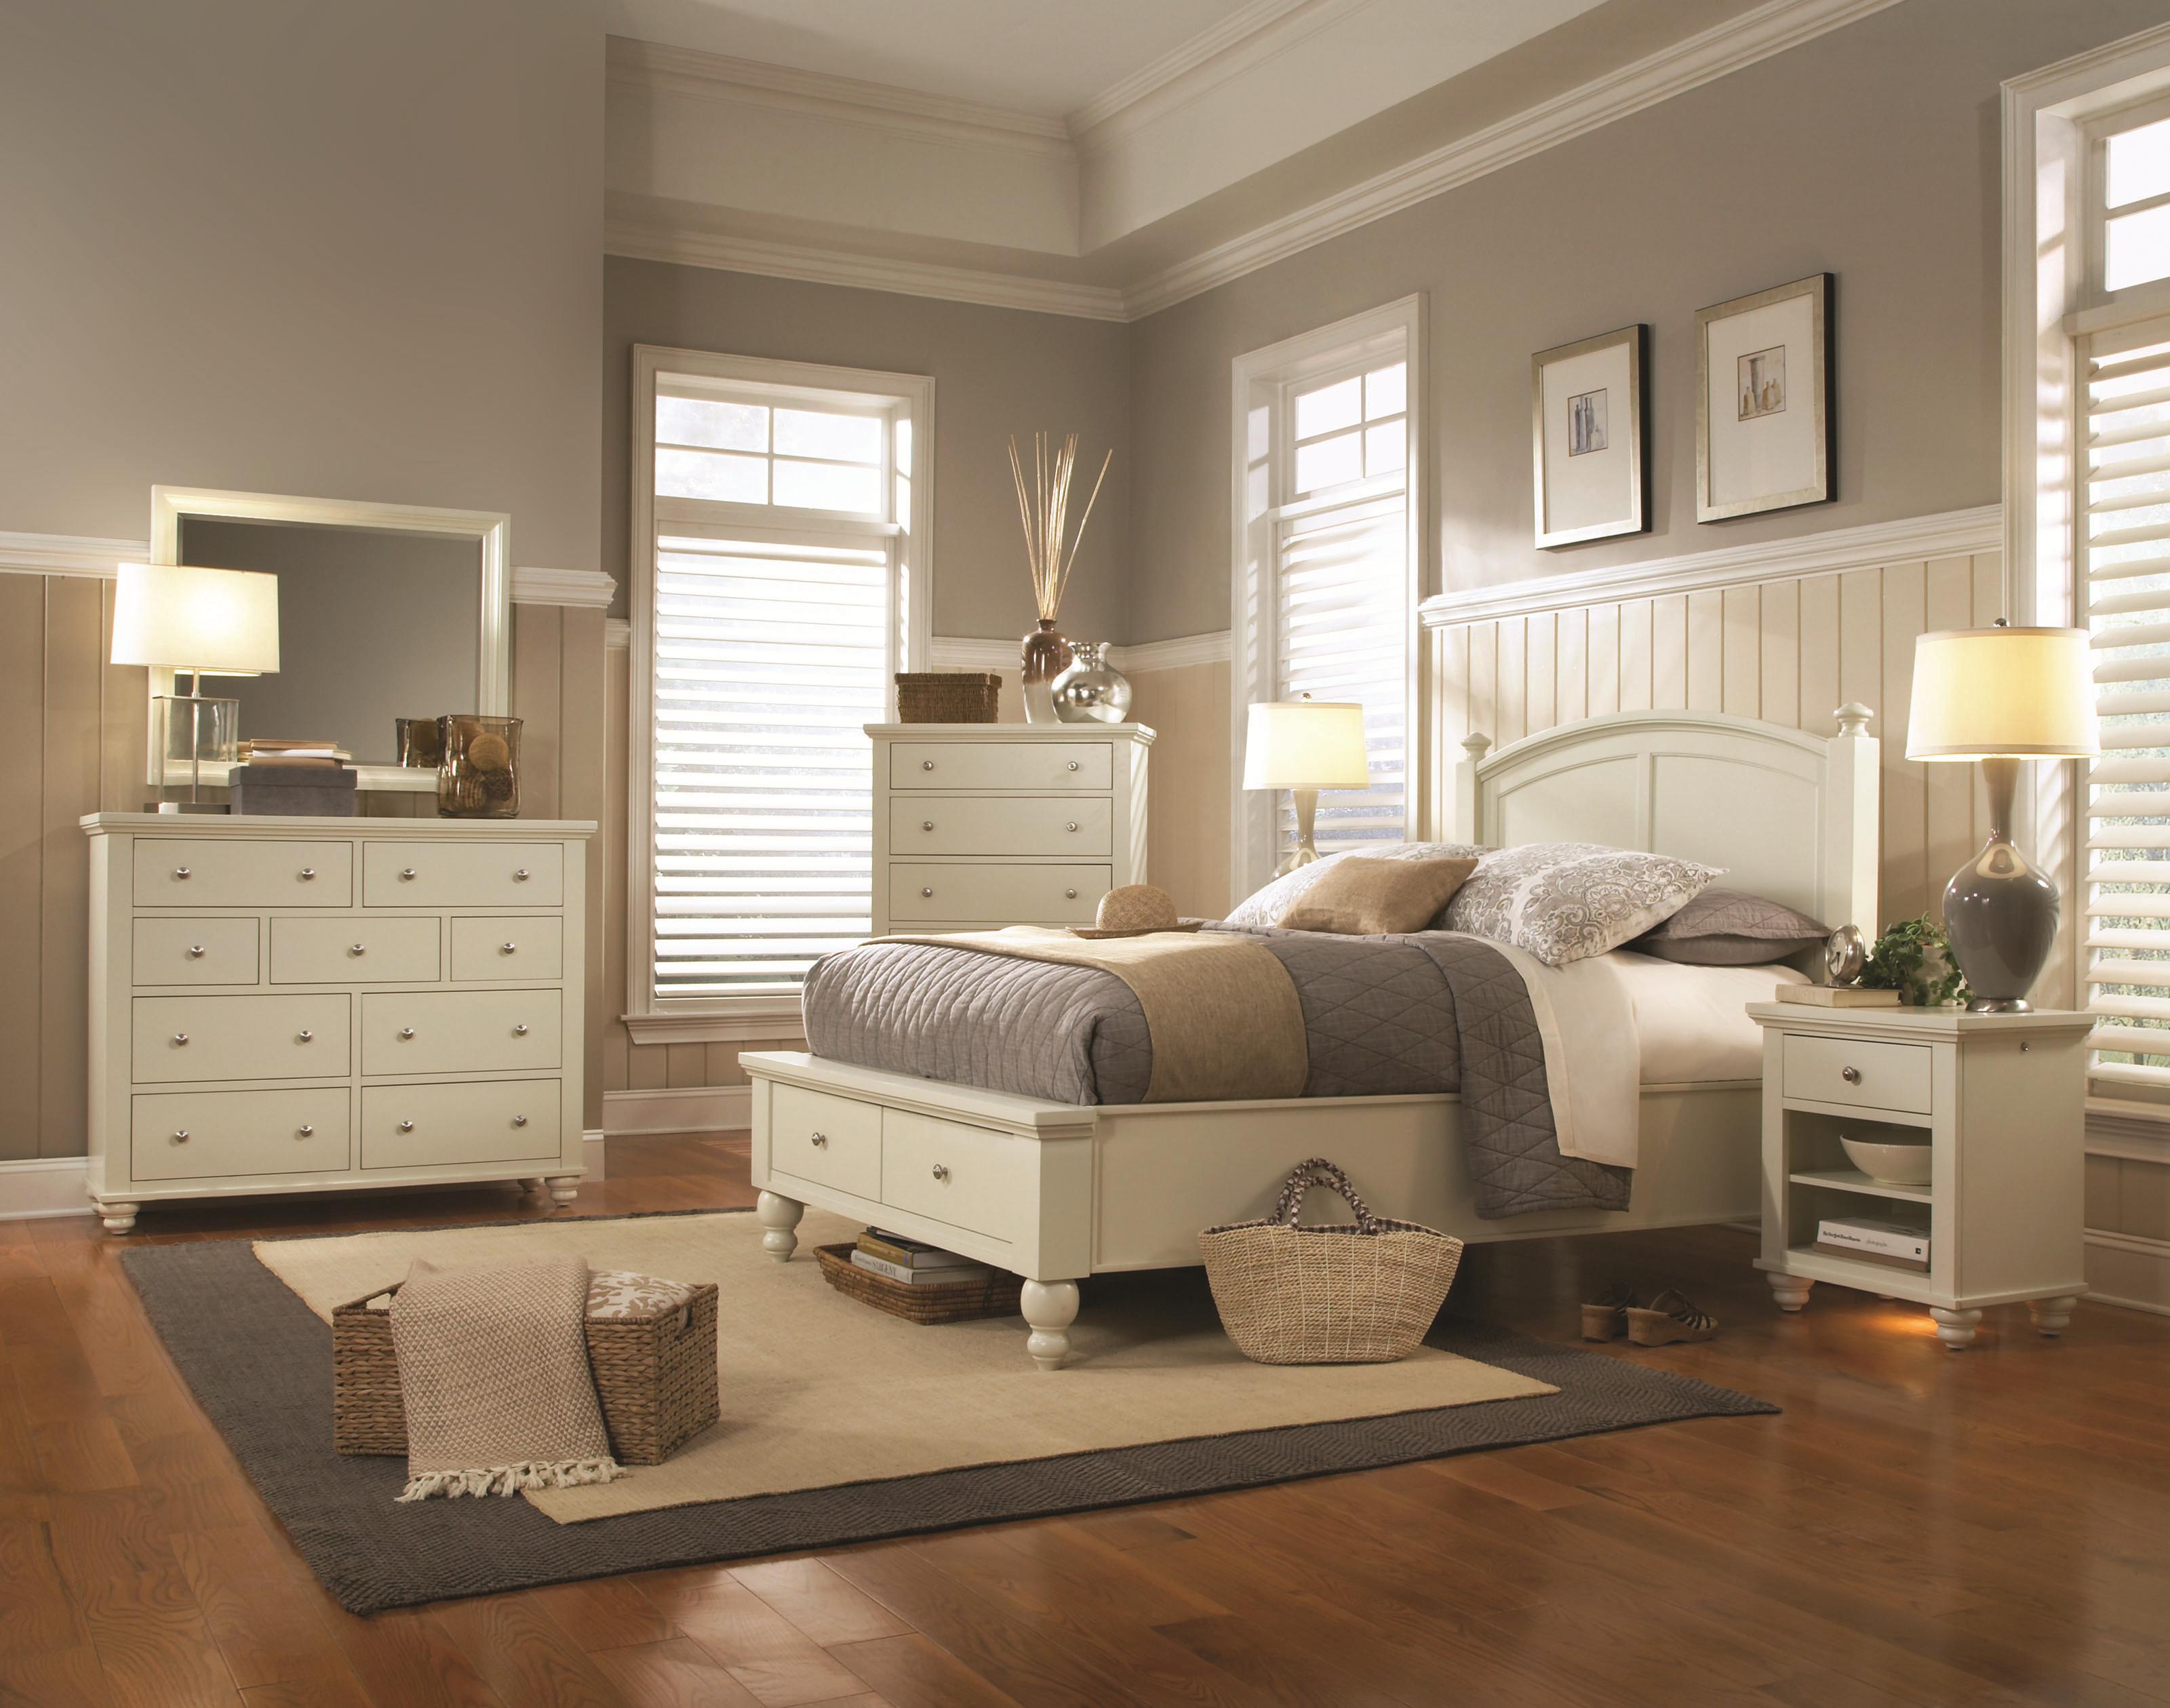 Etonnant Cambridge (CB EGG) By Aspenhome   Belfort Furniture   Aspenhome Cambridge  Dealer